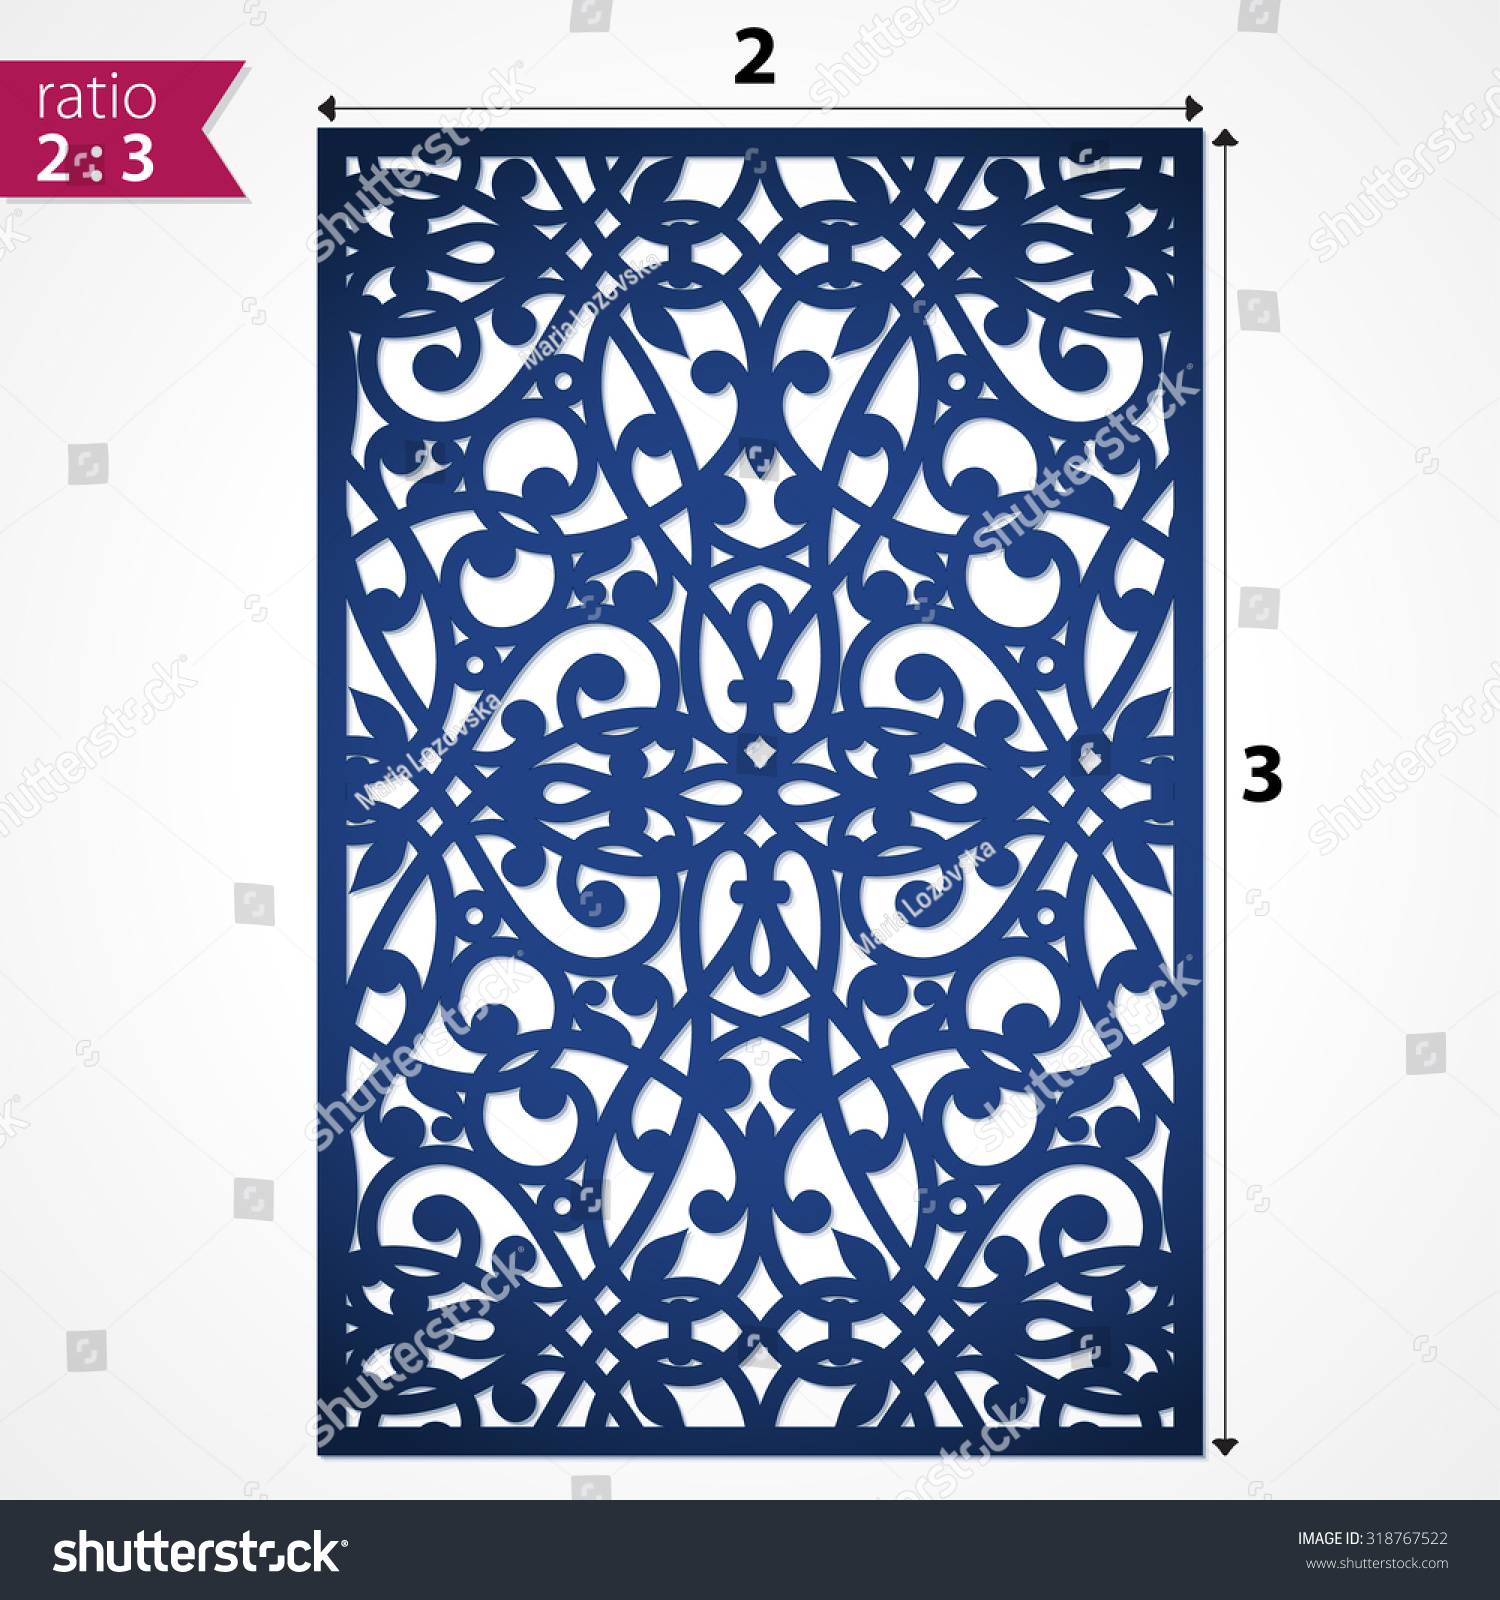 Lazer Cut Card. Silhouette Pattern. Cutout Paperwork. Cabinet Fretwork  Panel. Filigree Decorative Pattern. Lasercut Metal Panel. Wood Carving.  Stock Photo